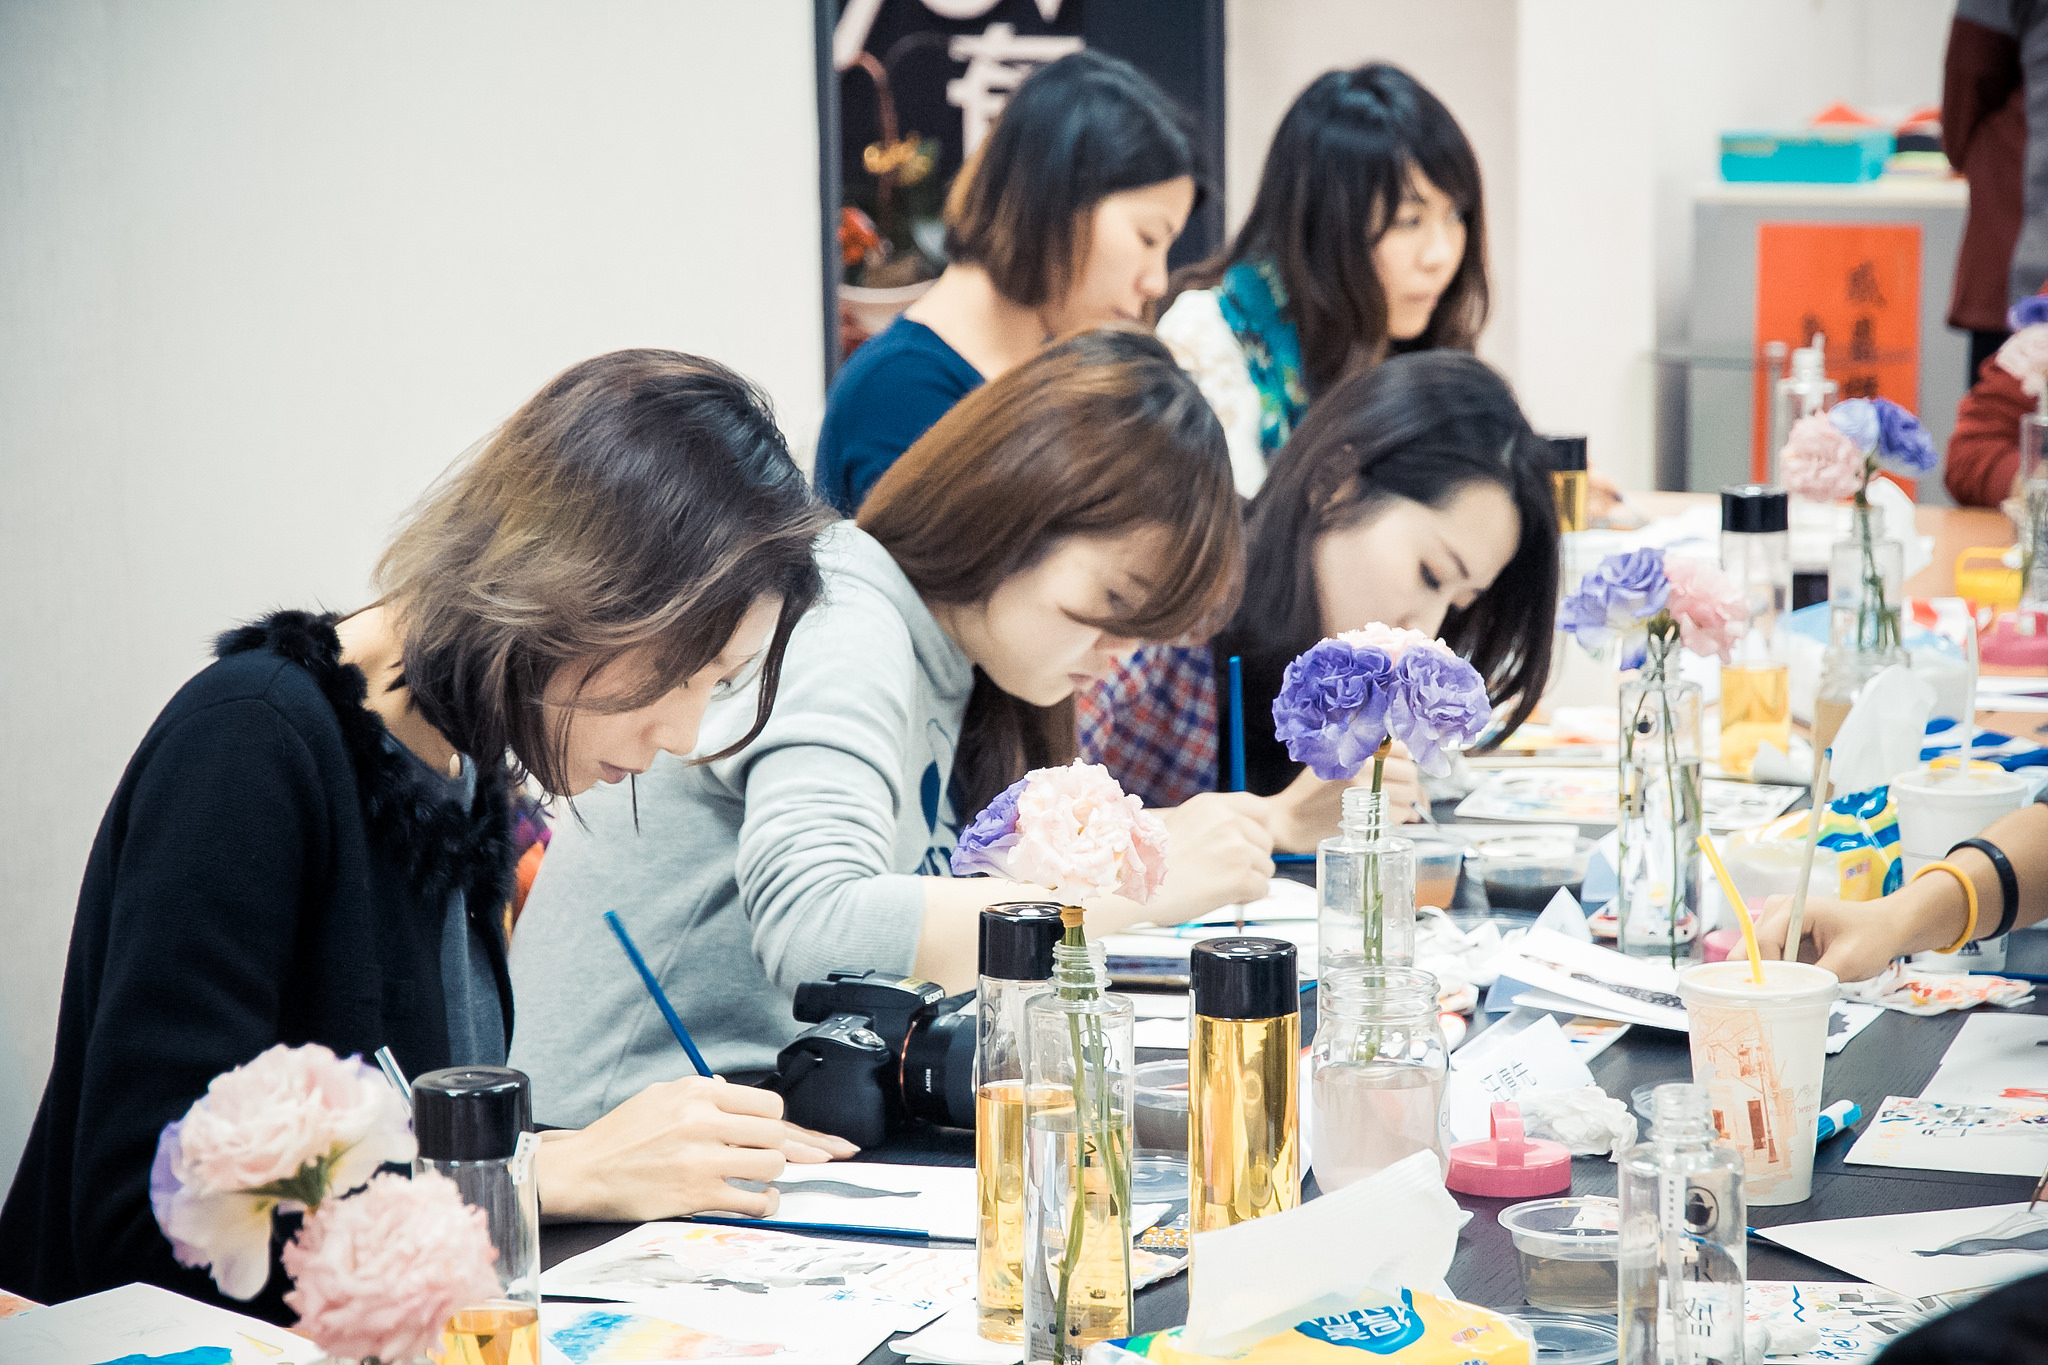 Grace-Ciao-Fashion-Illustration-Event-Taipei-Careher-Workshop-Participants.jpg